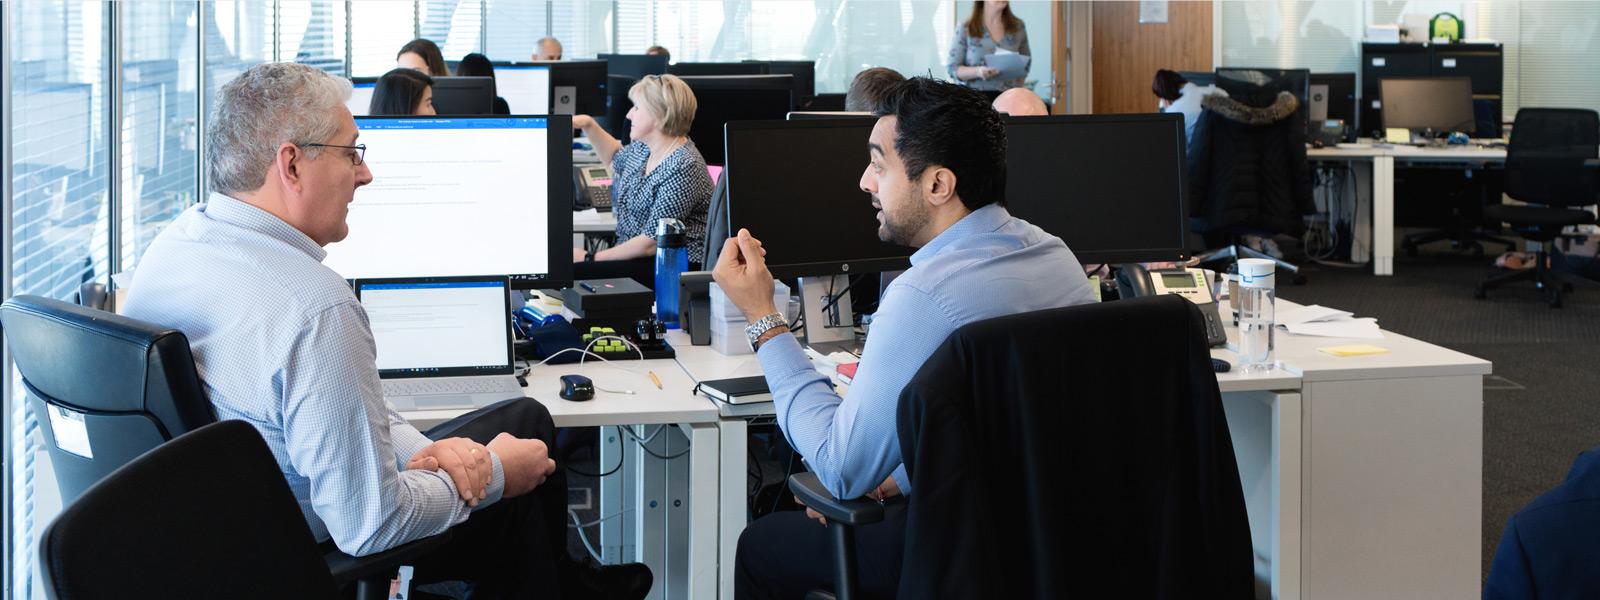 Two men talking at a desk